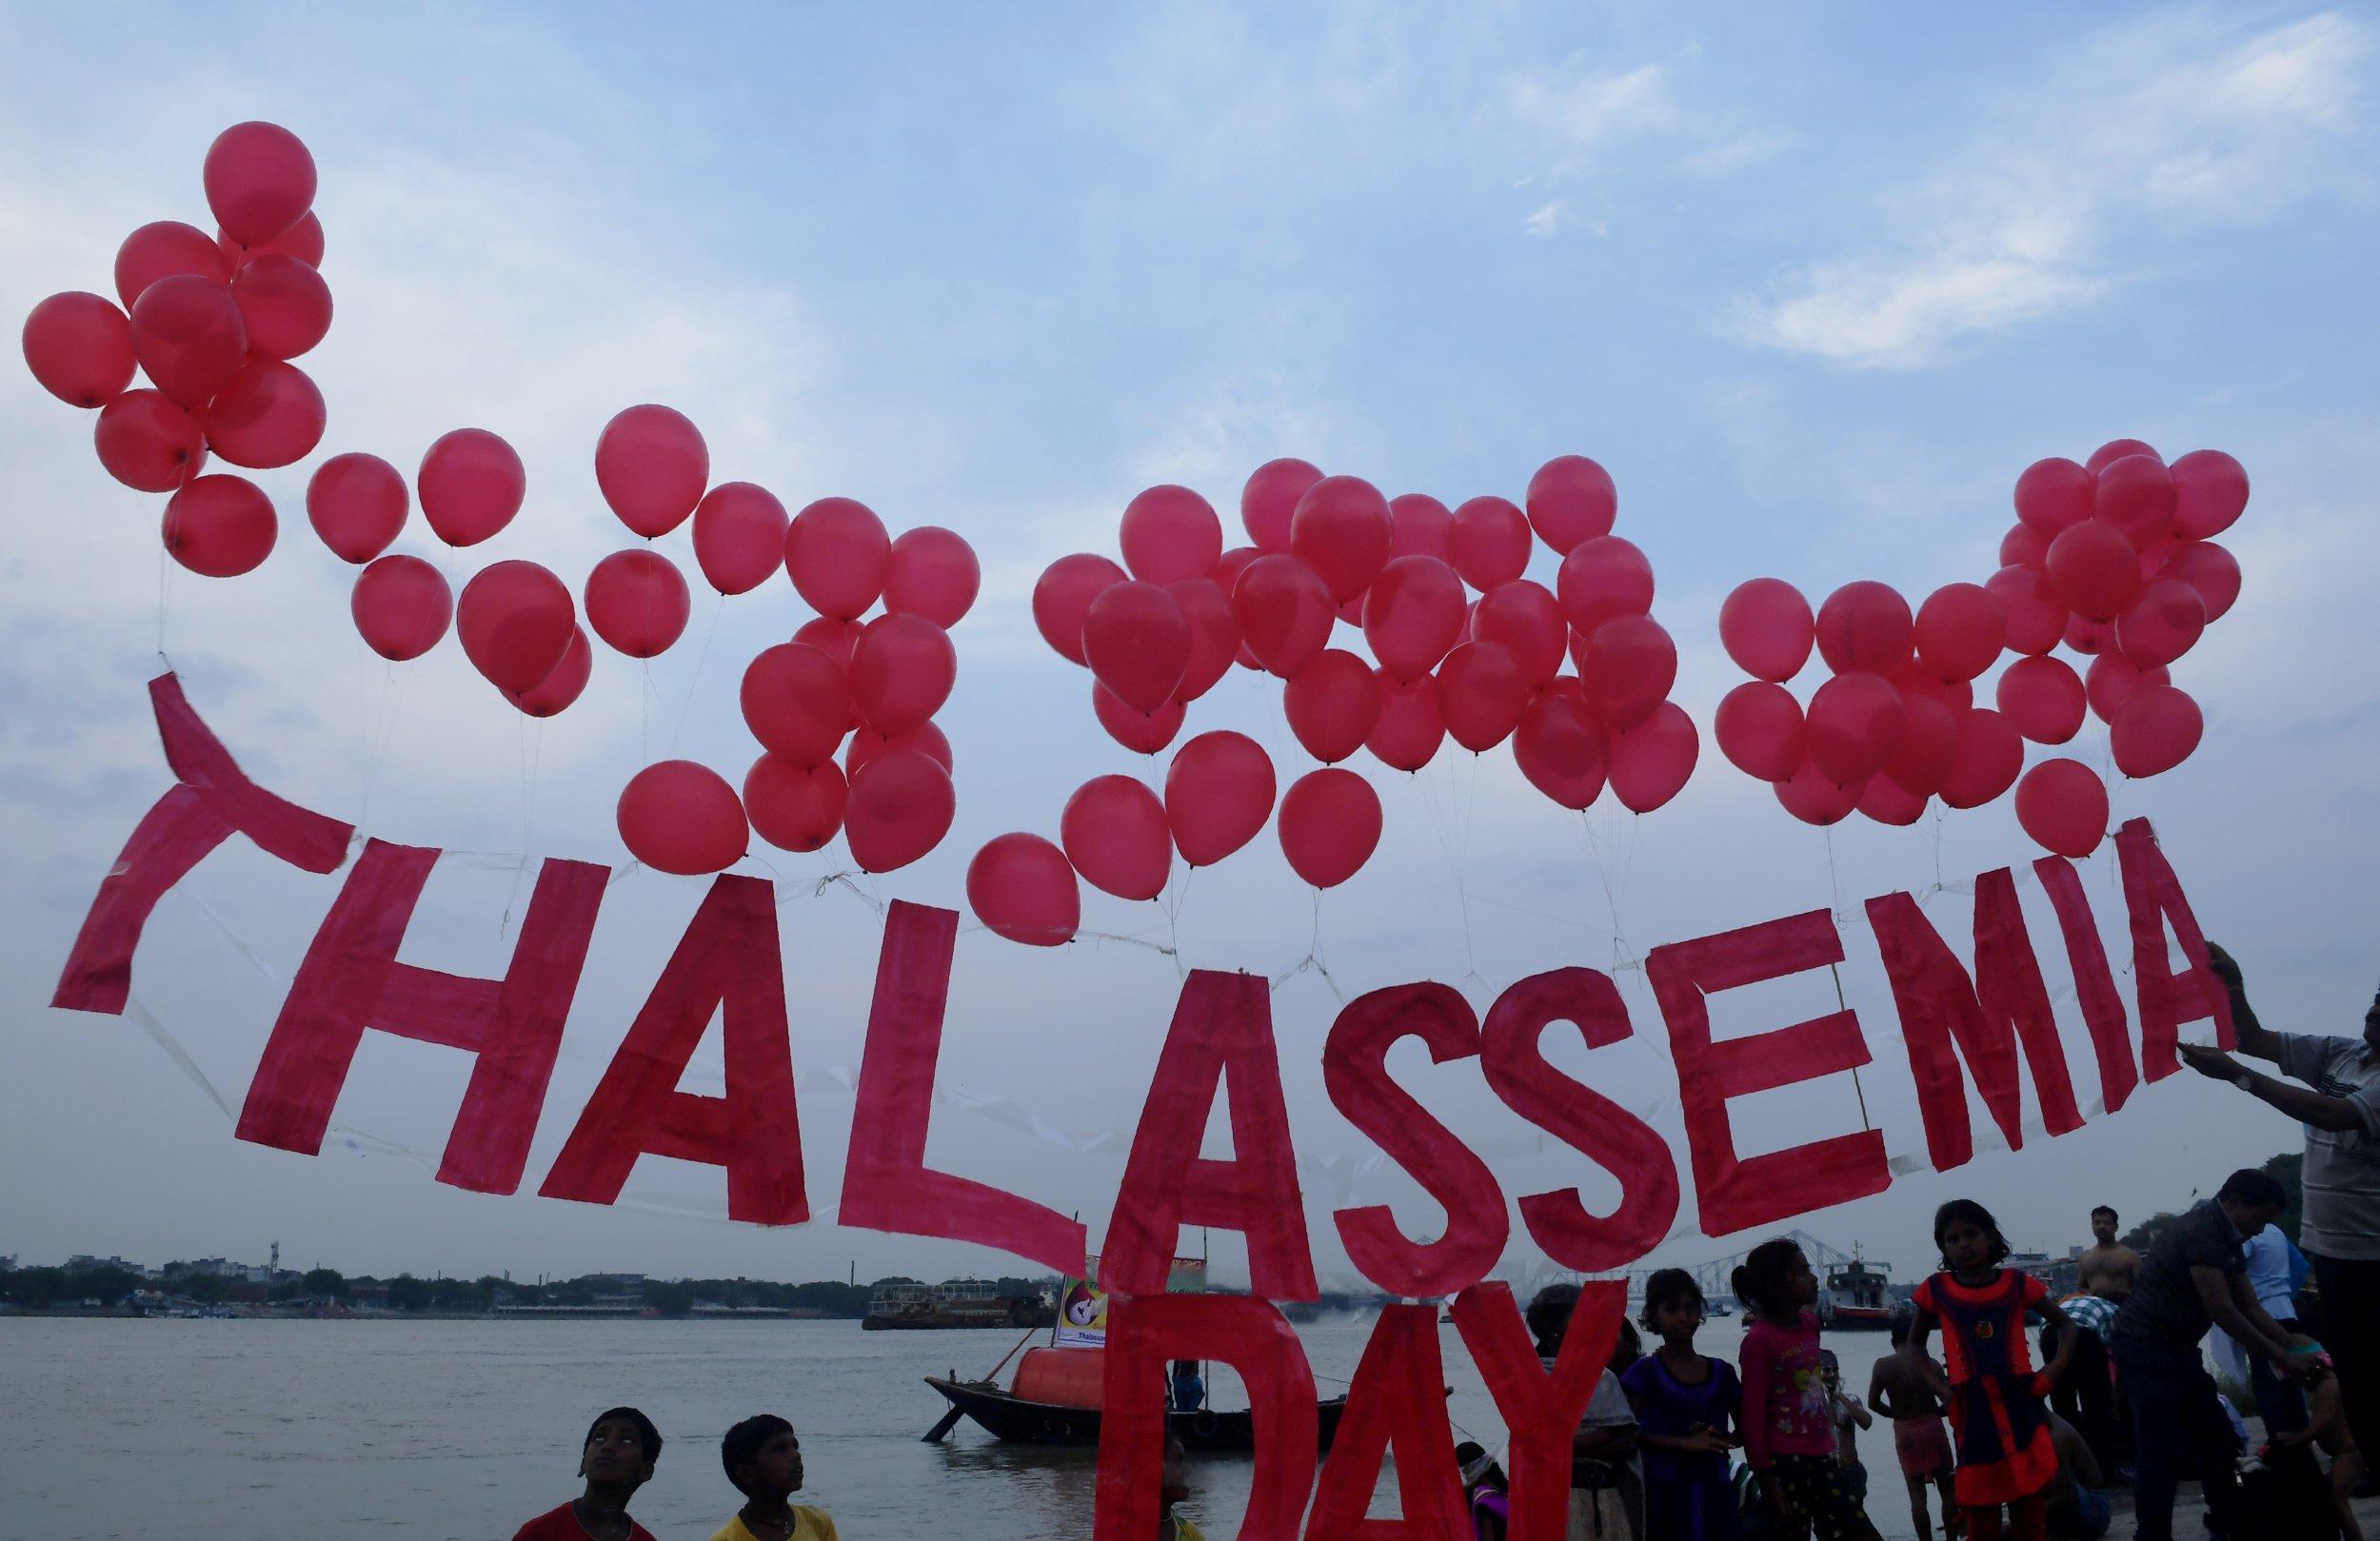 4_16_Thalassemia Day